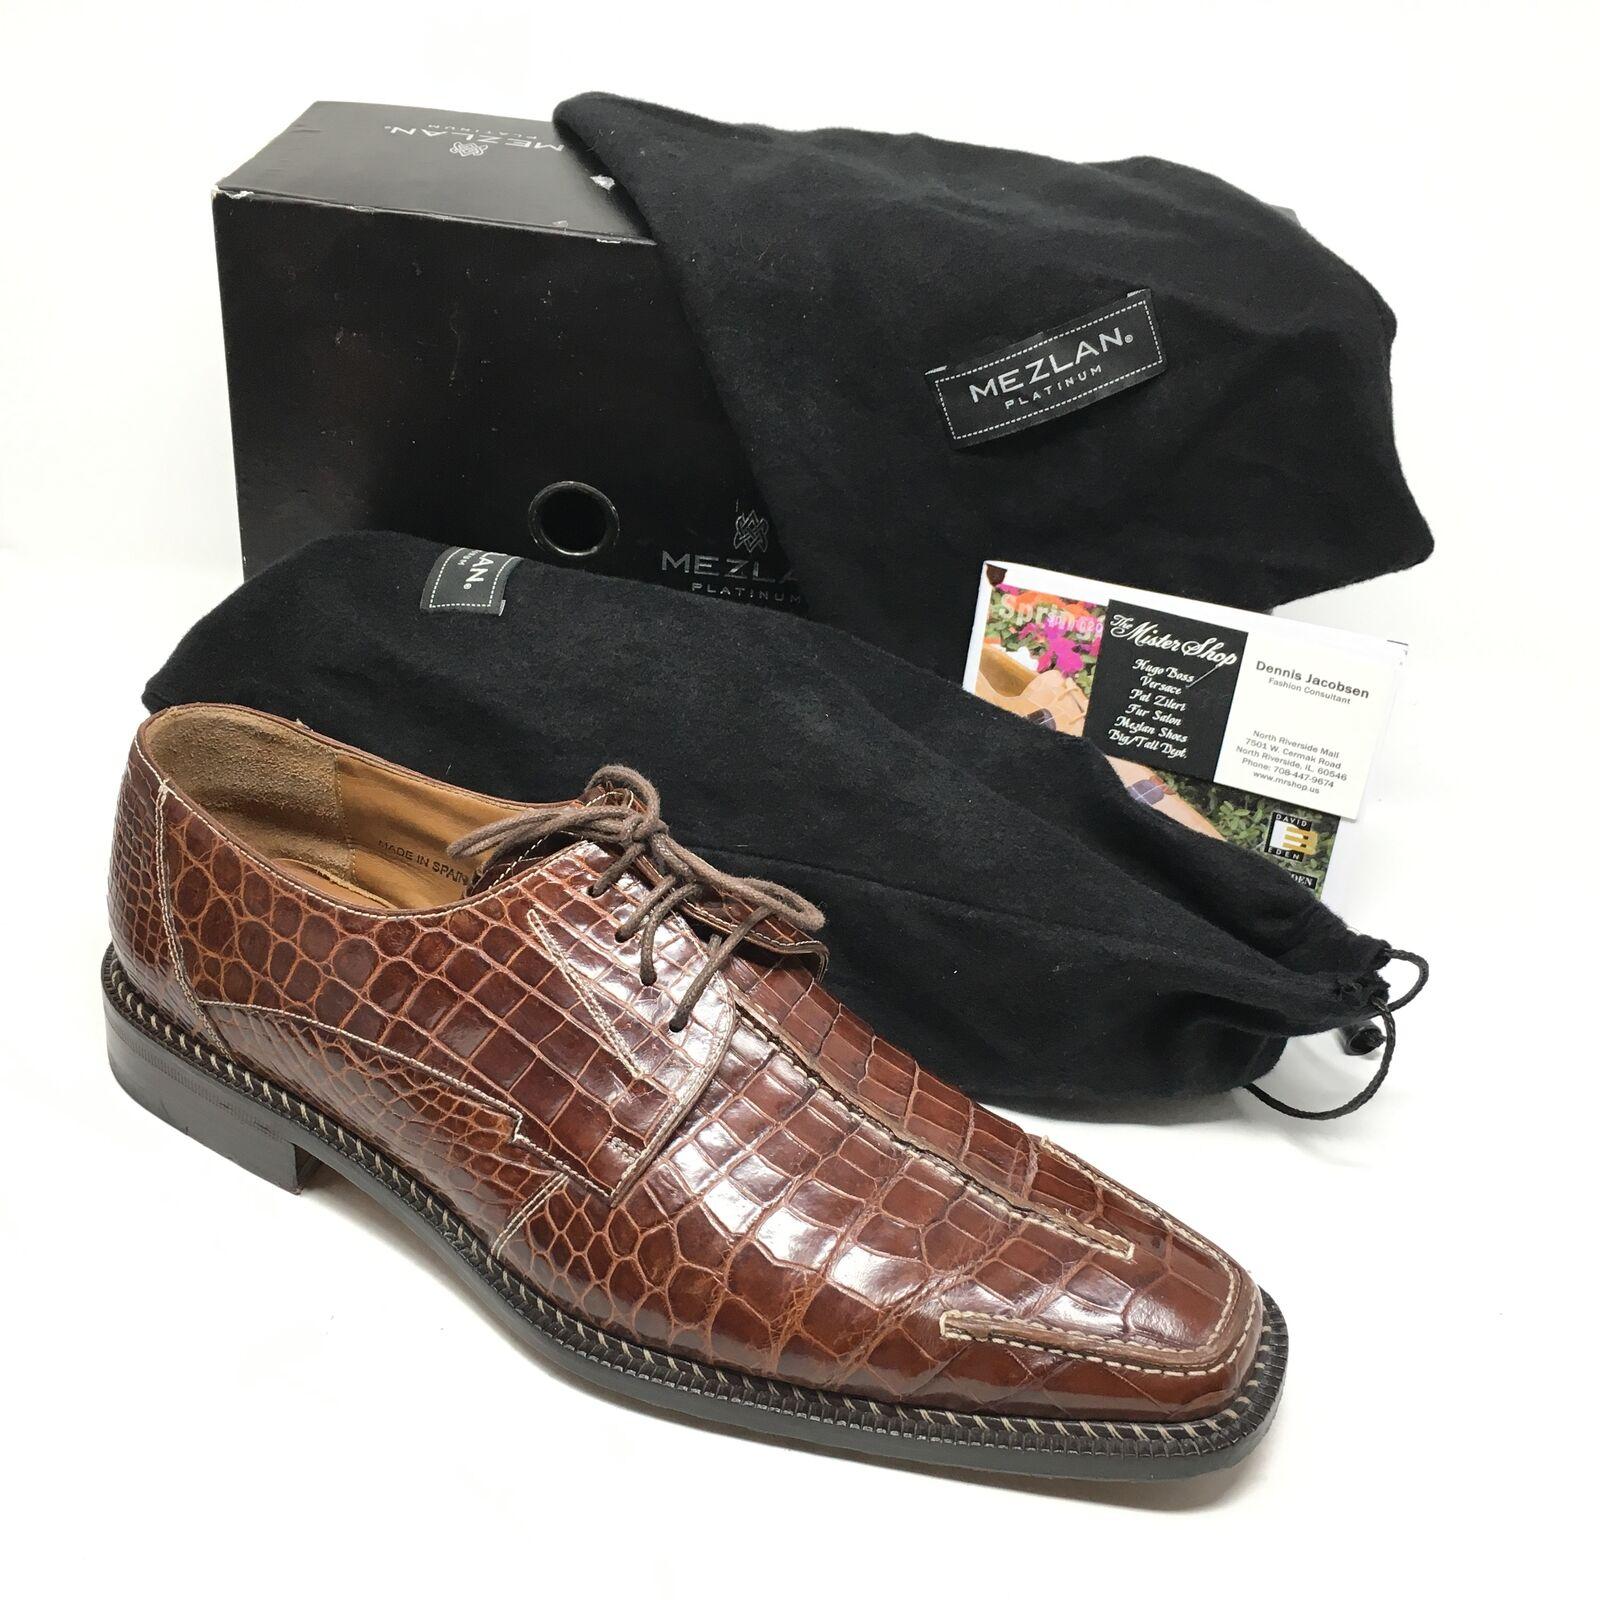 Para Hombre Zapato mezlan Platinum negroston Oxfords tamaño 10.5M Marrón Cocodrilo Completo Q15